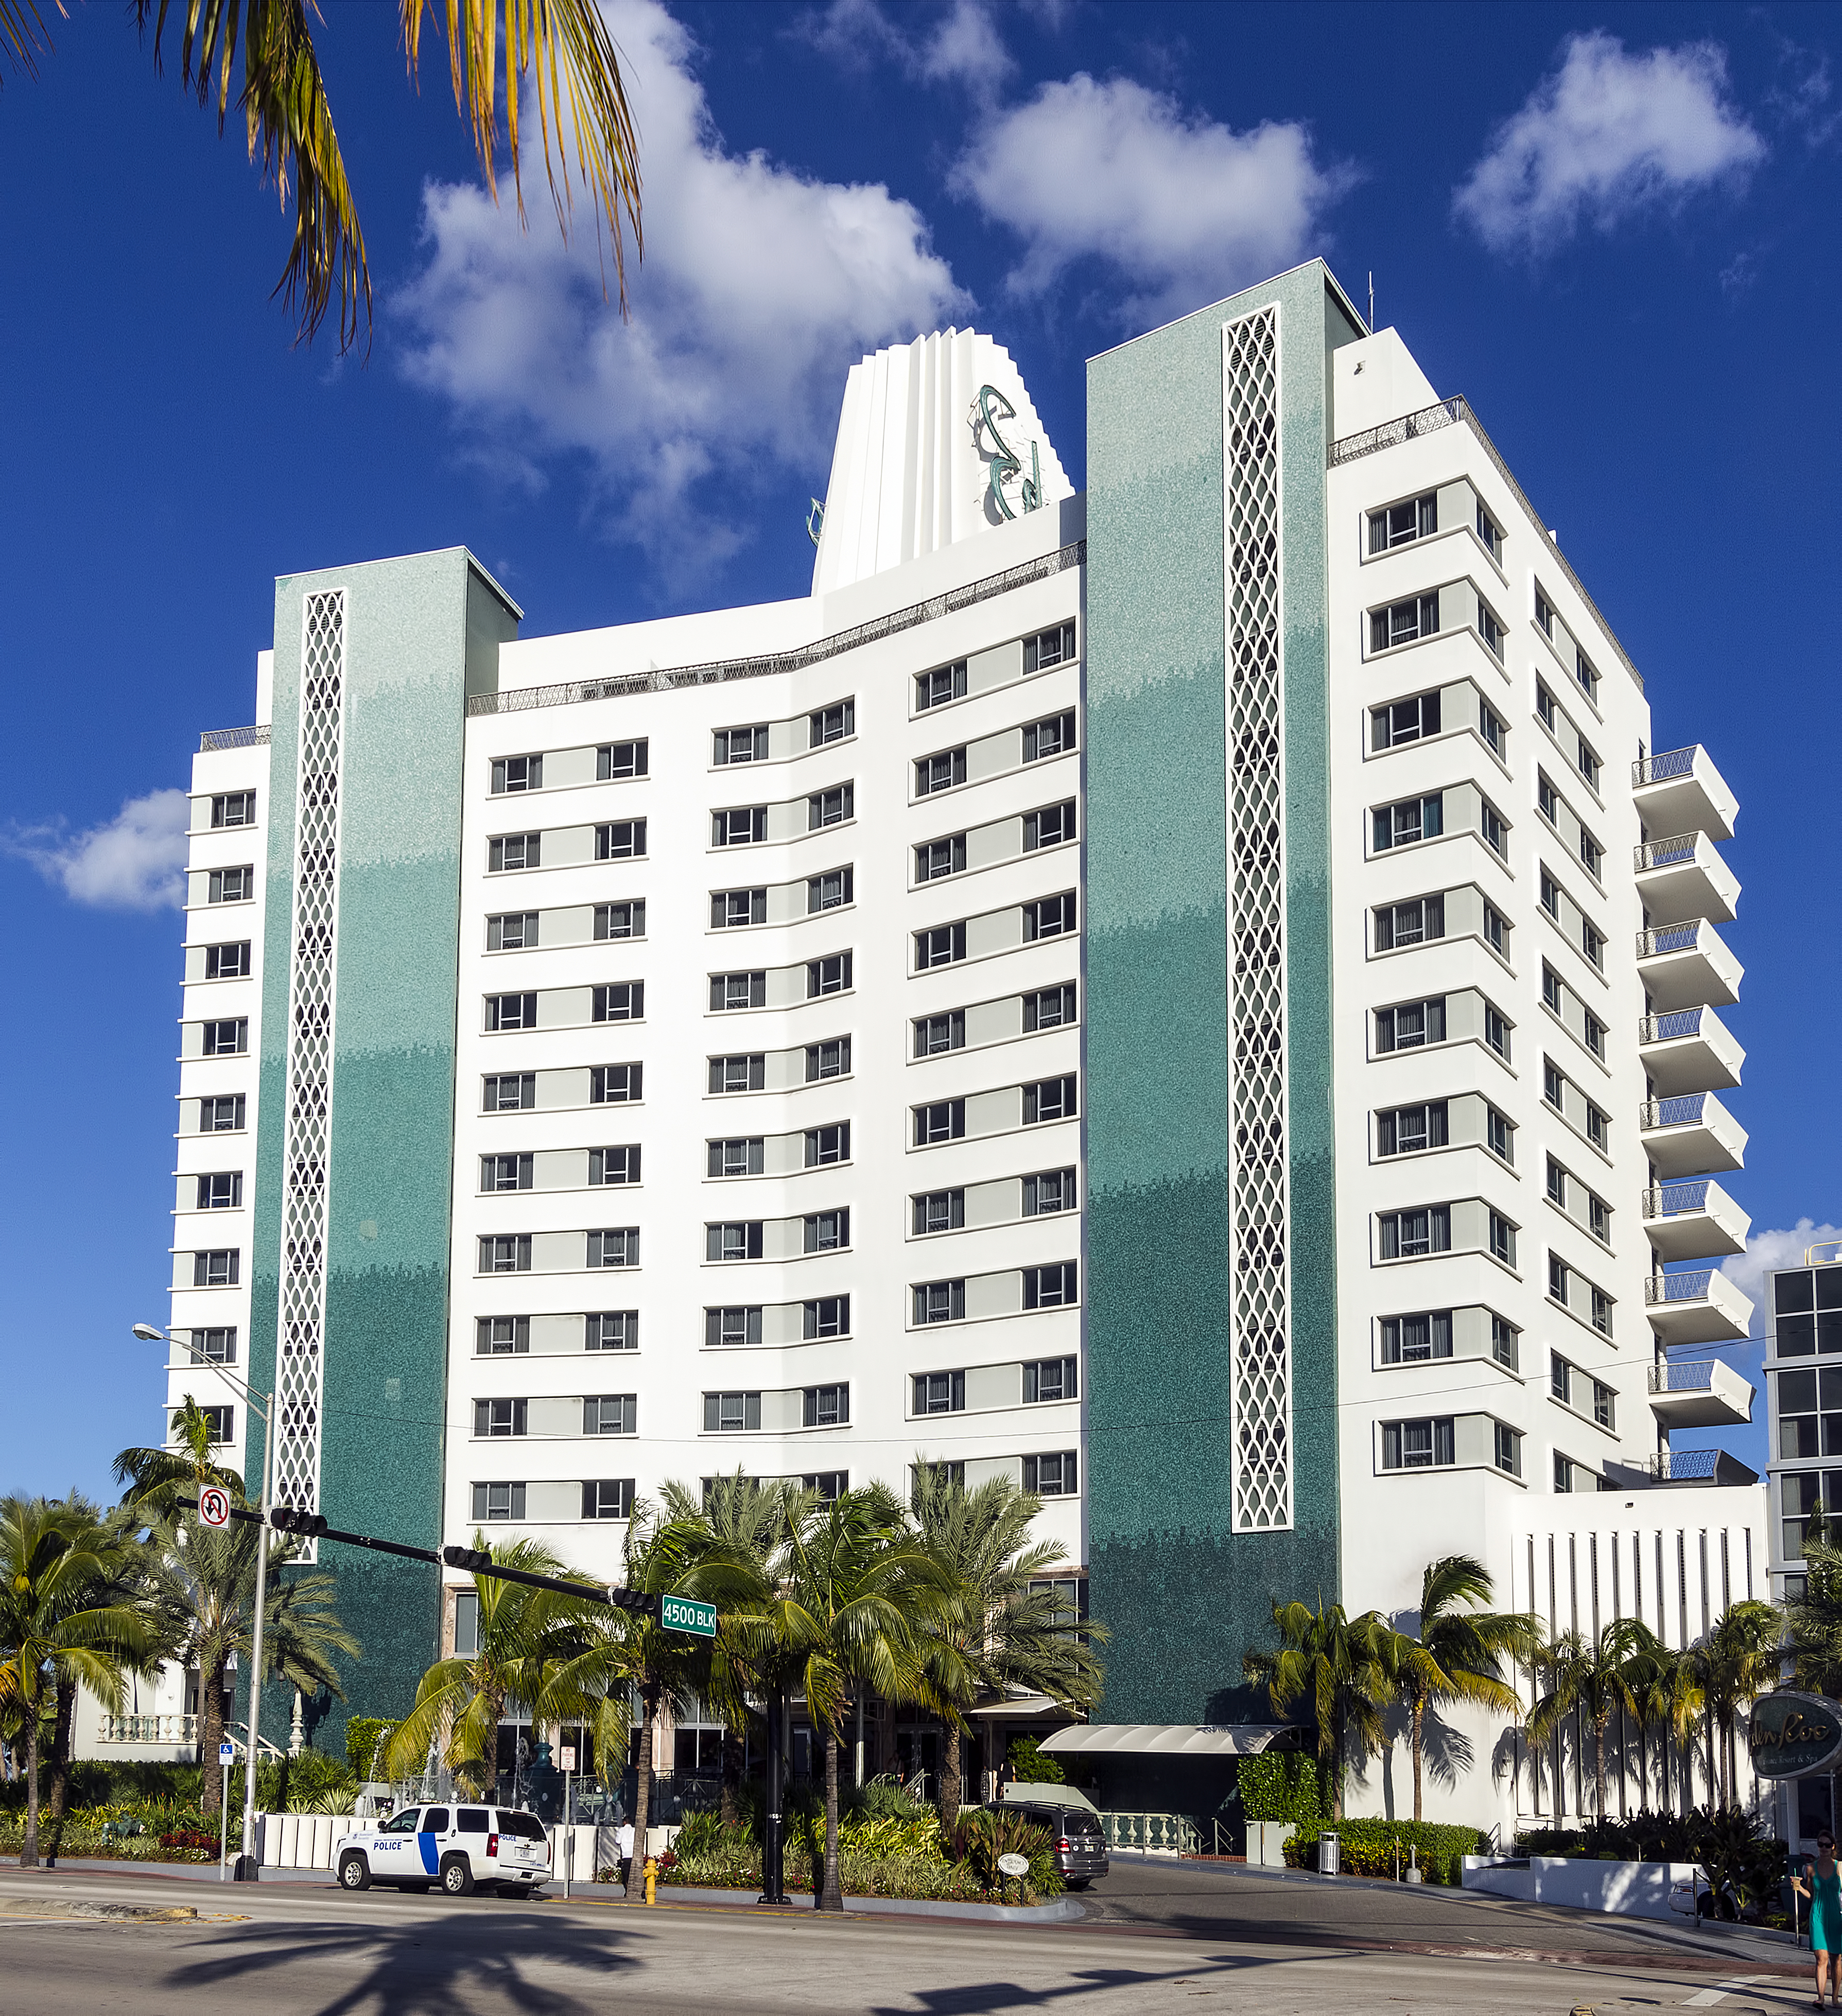 Mia Hotel Miami International Airport